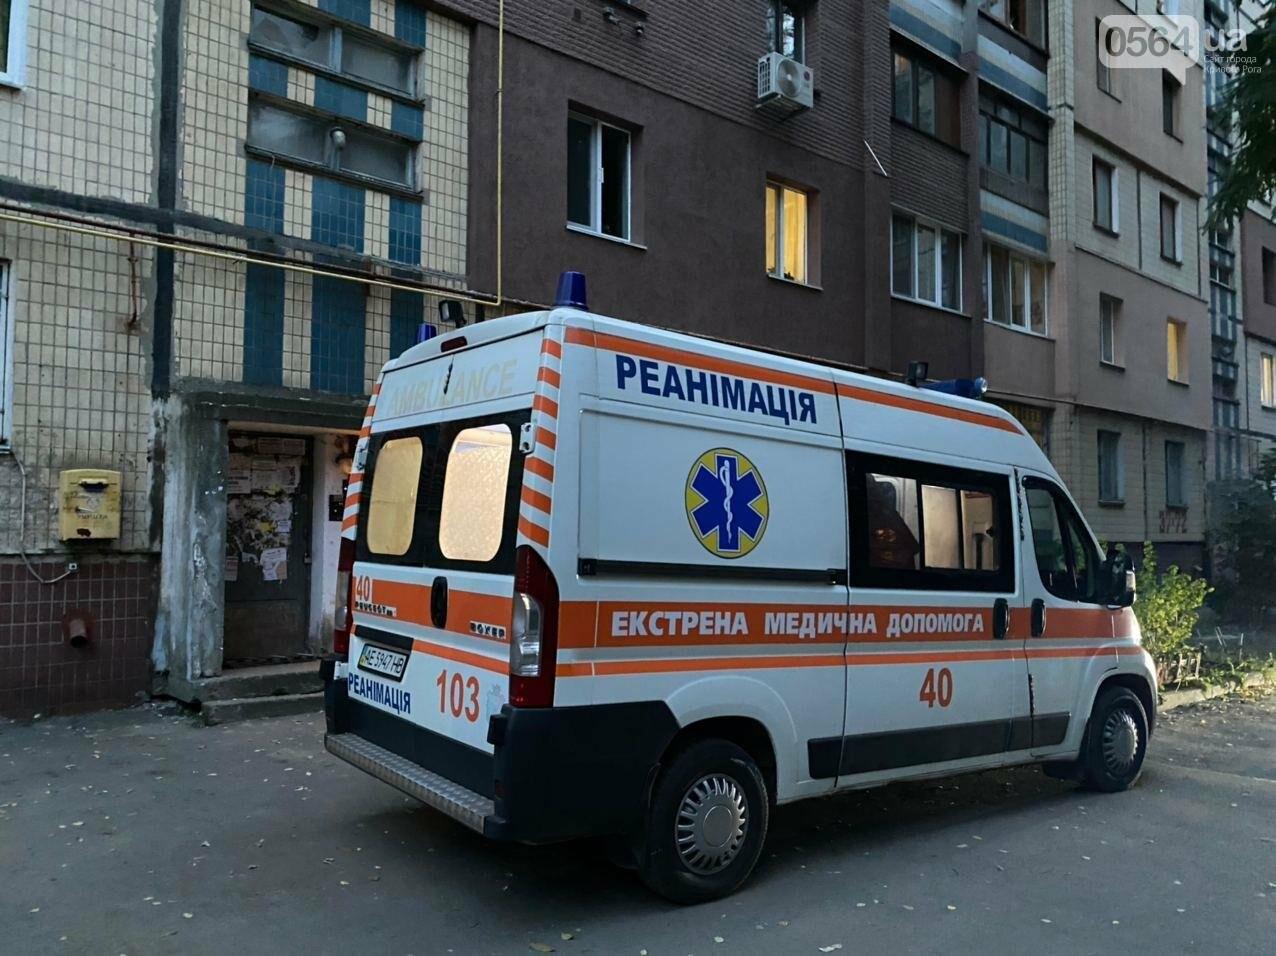 В Кривом Роге погиб мужчина, упавший с 5 этажа жилого дома, - ФОТО 18+, фото-1